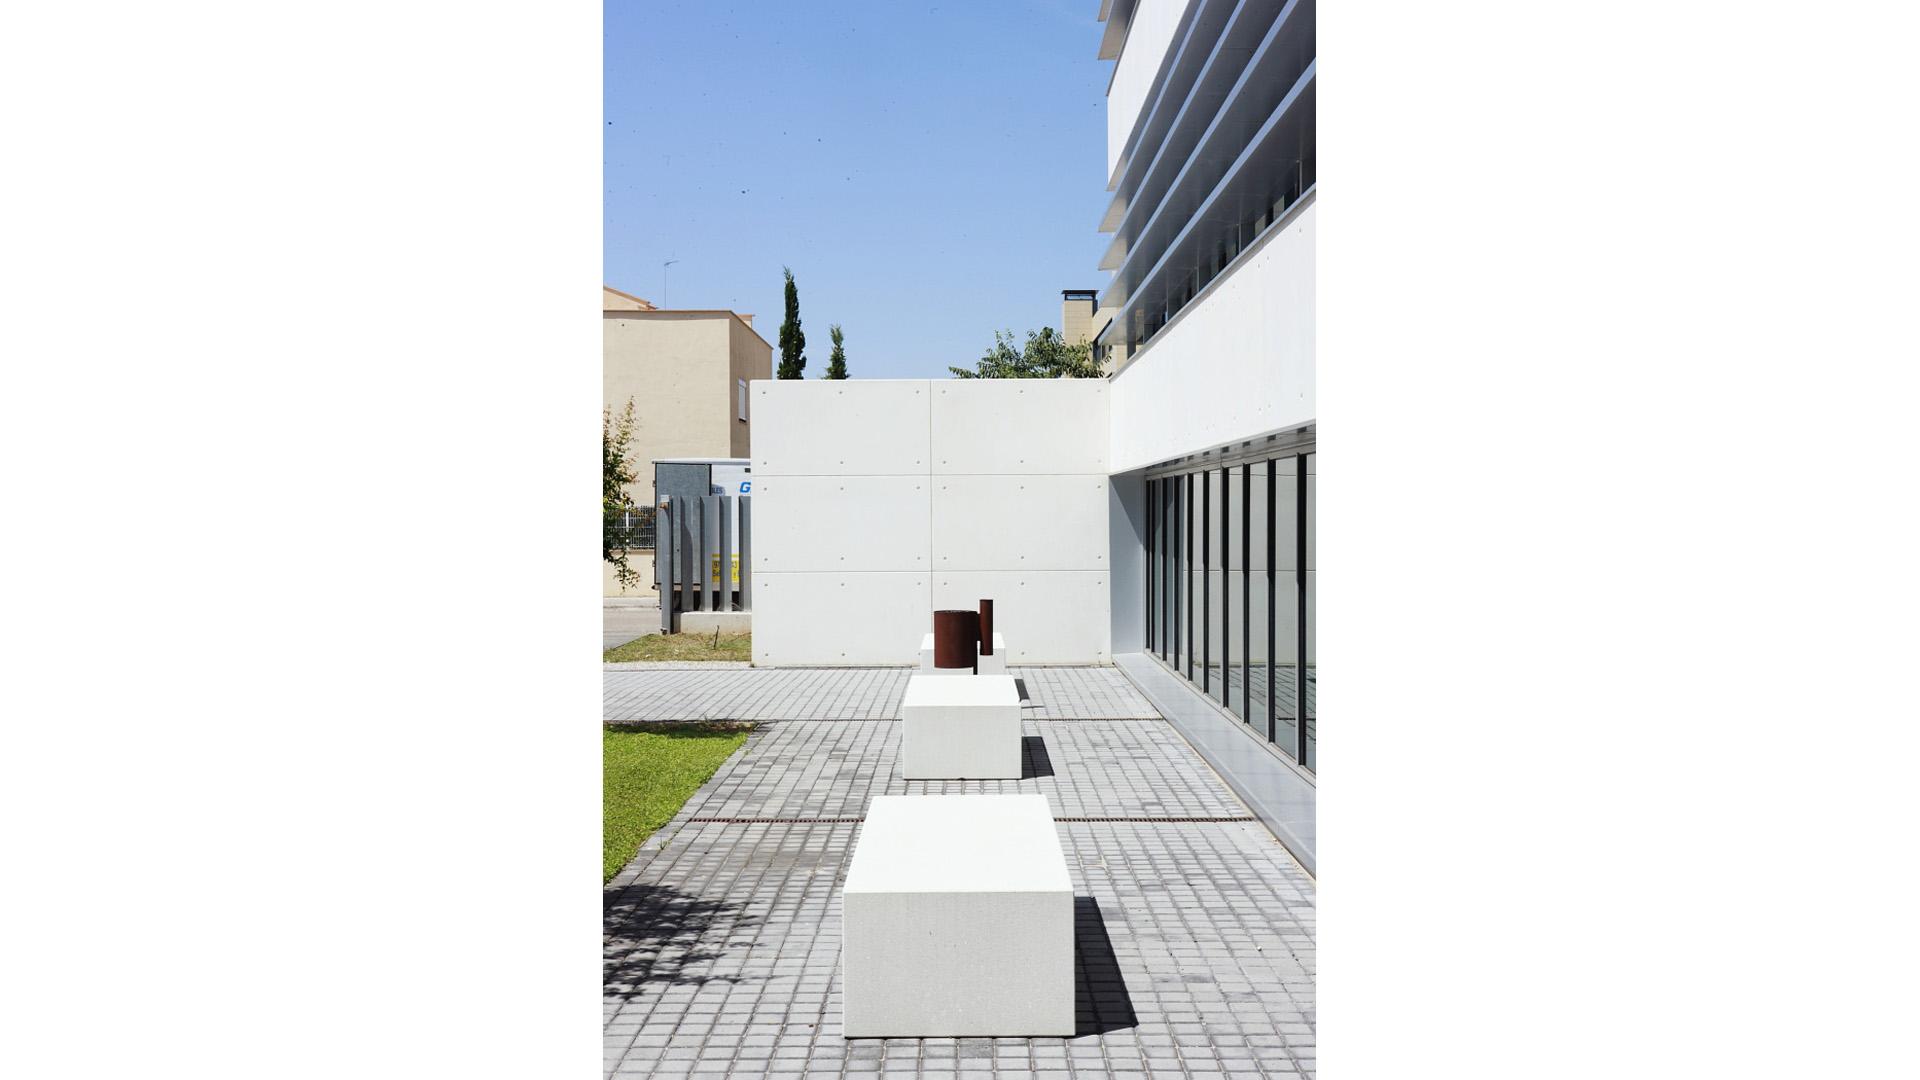 Sct estudio de arquitectura ficha del proyecto - Garcia ruiz arquitectos ...